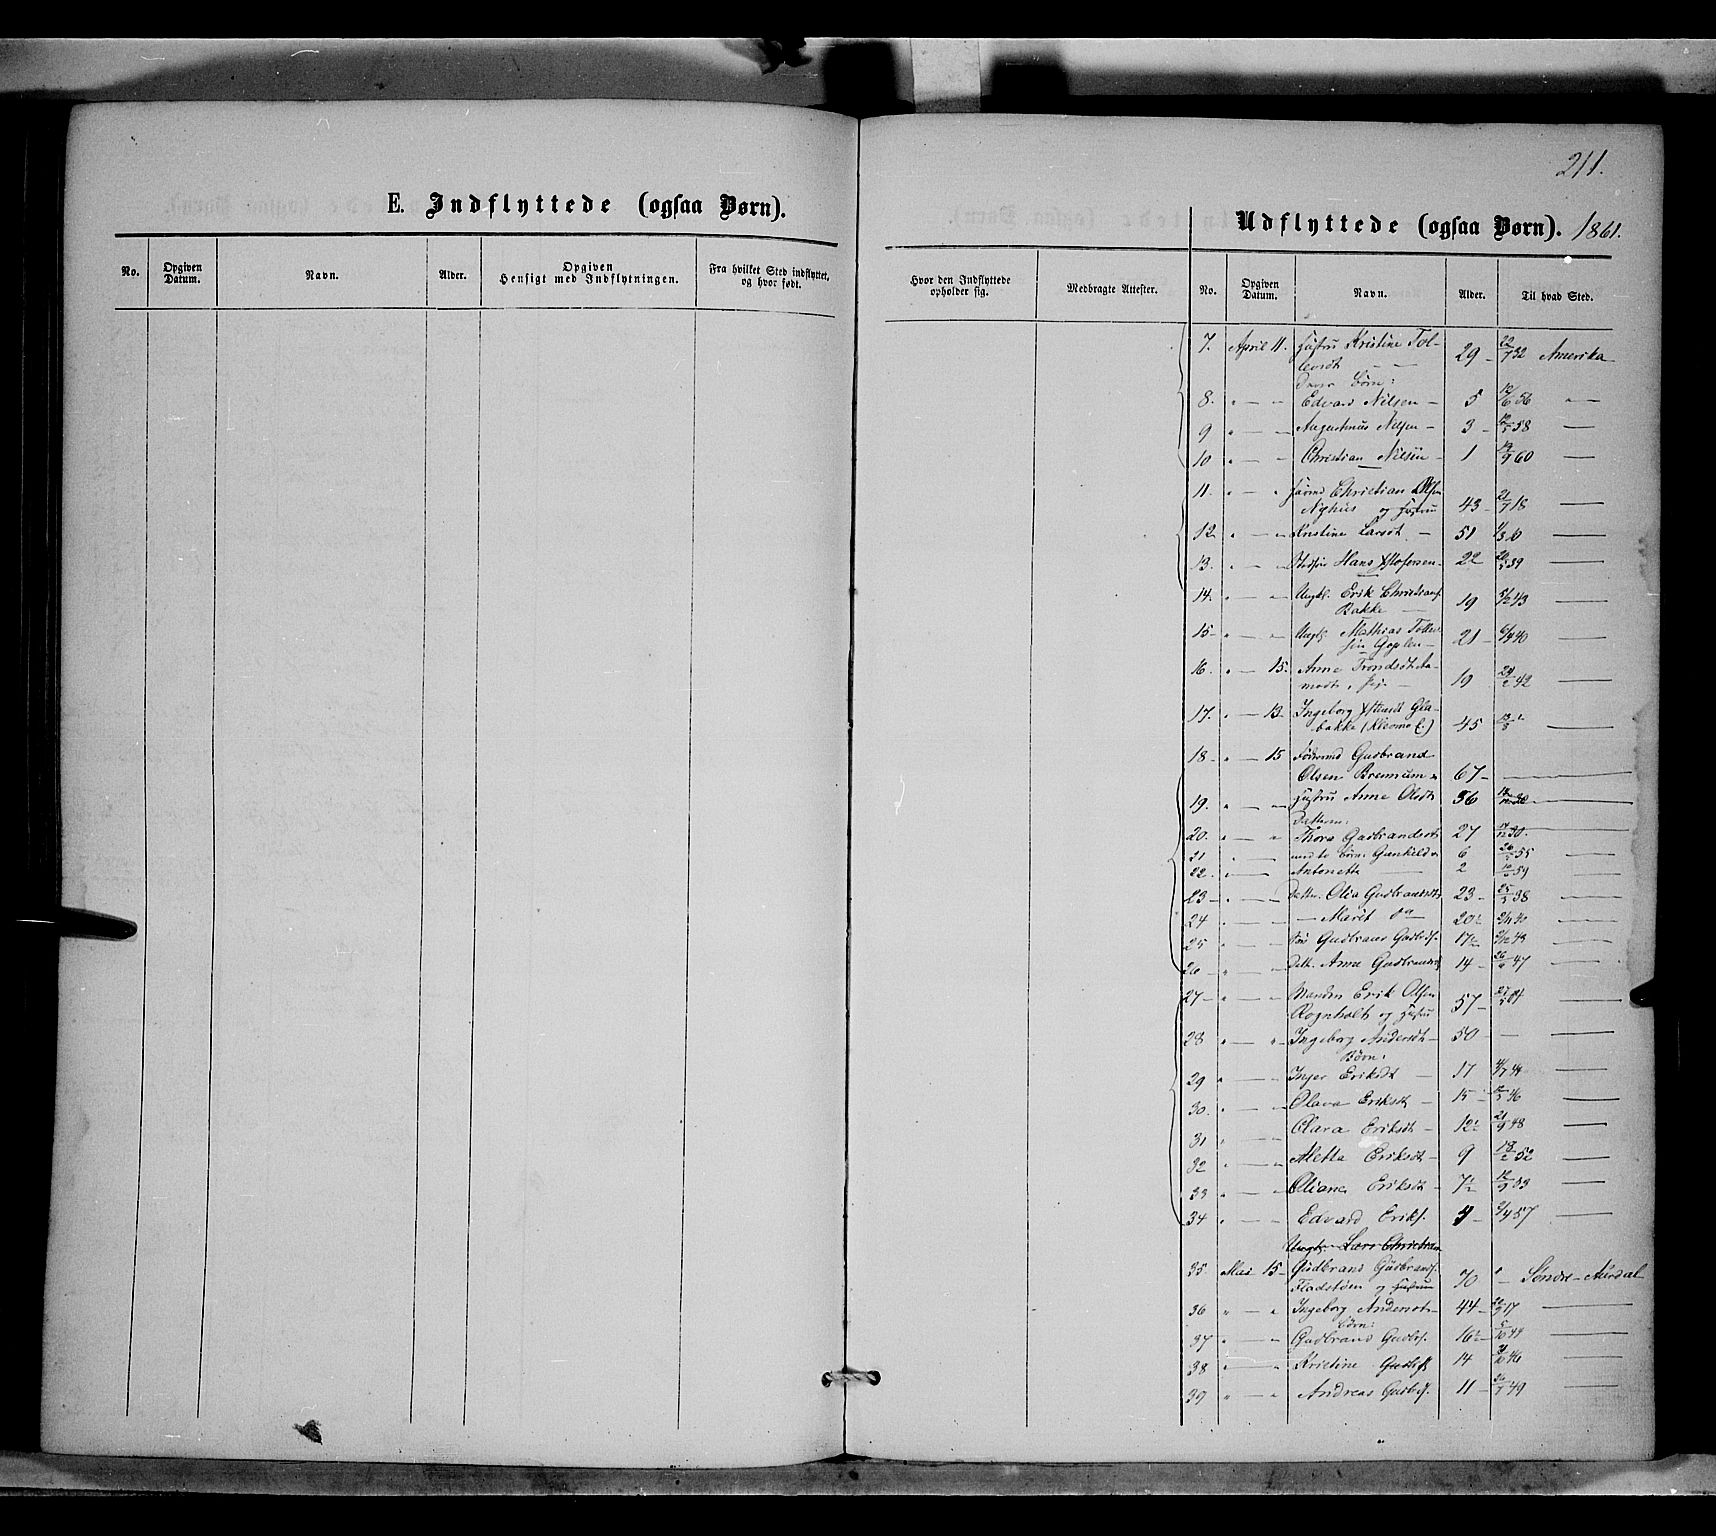 SAH, Nordre Land prestekontor, Ministerialbok nr. 1, 1860-1871, s. 211